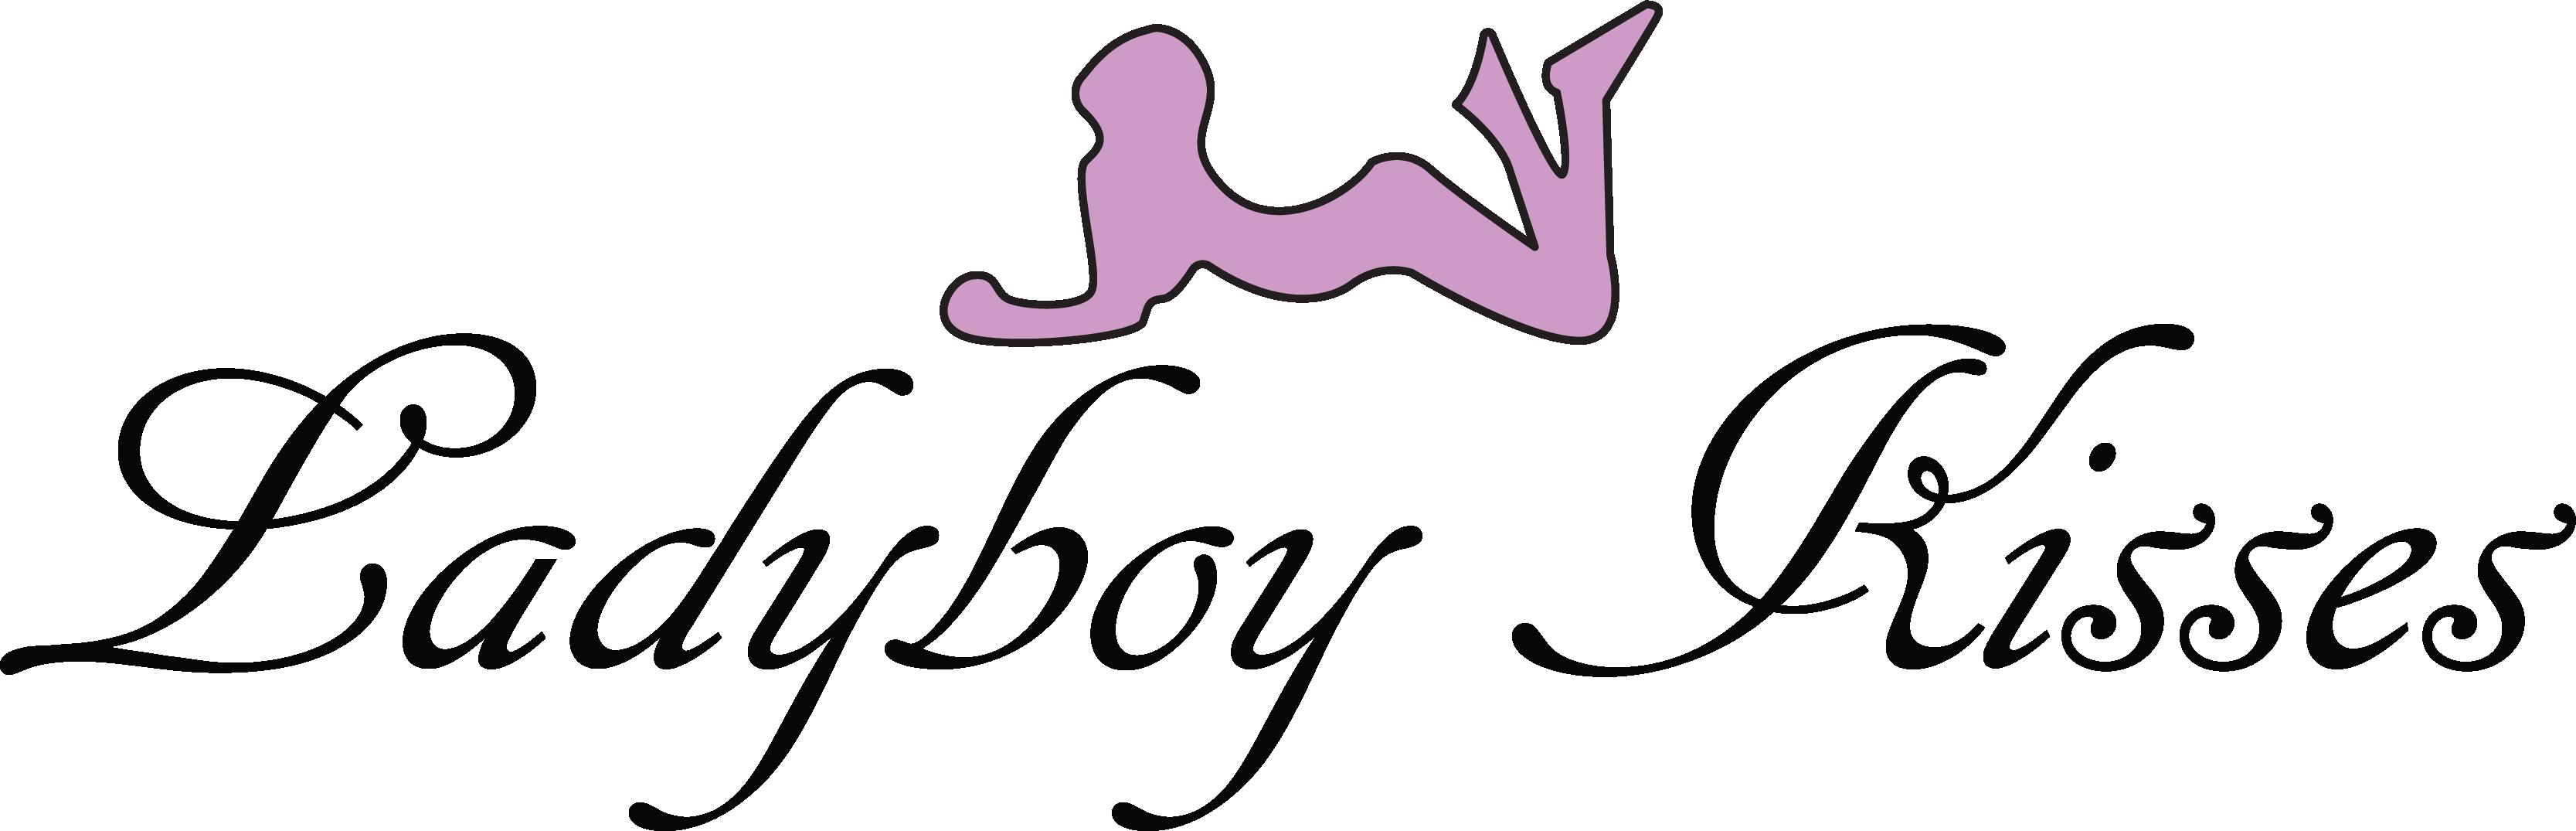 Ladyboykisses Logo